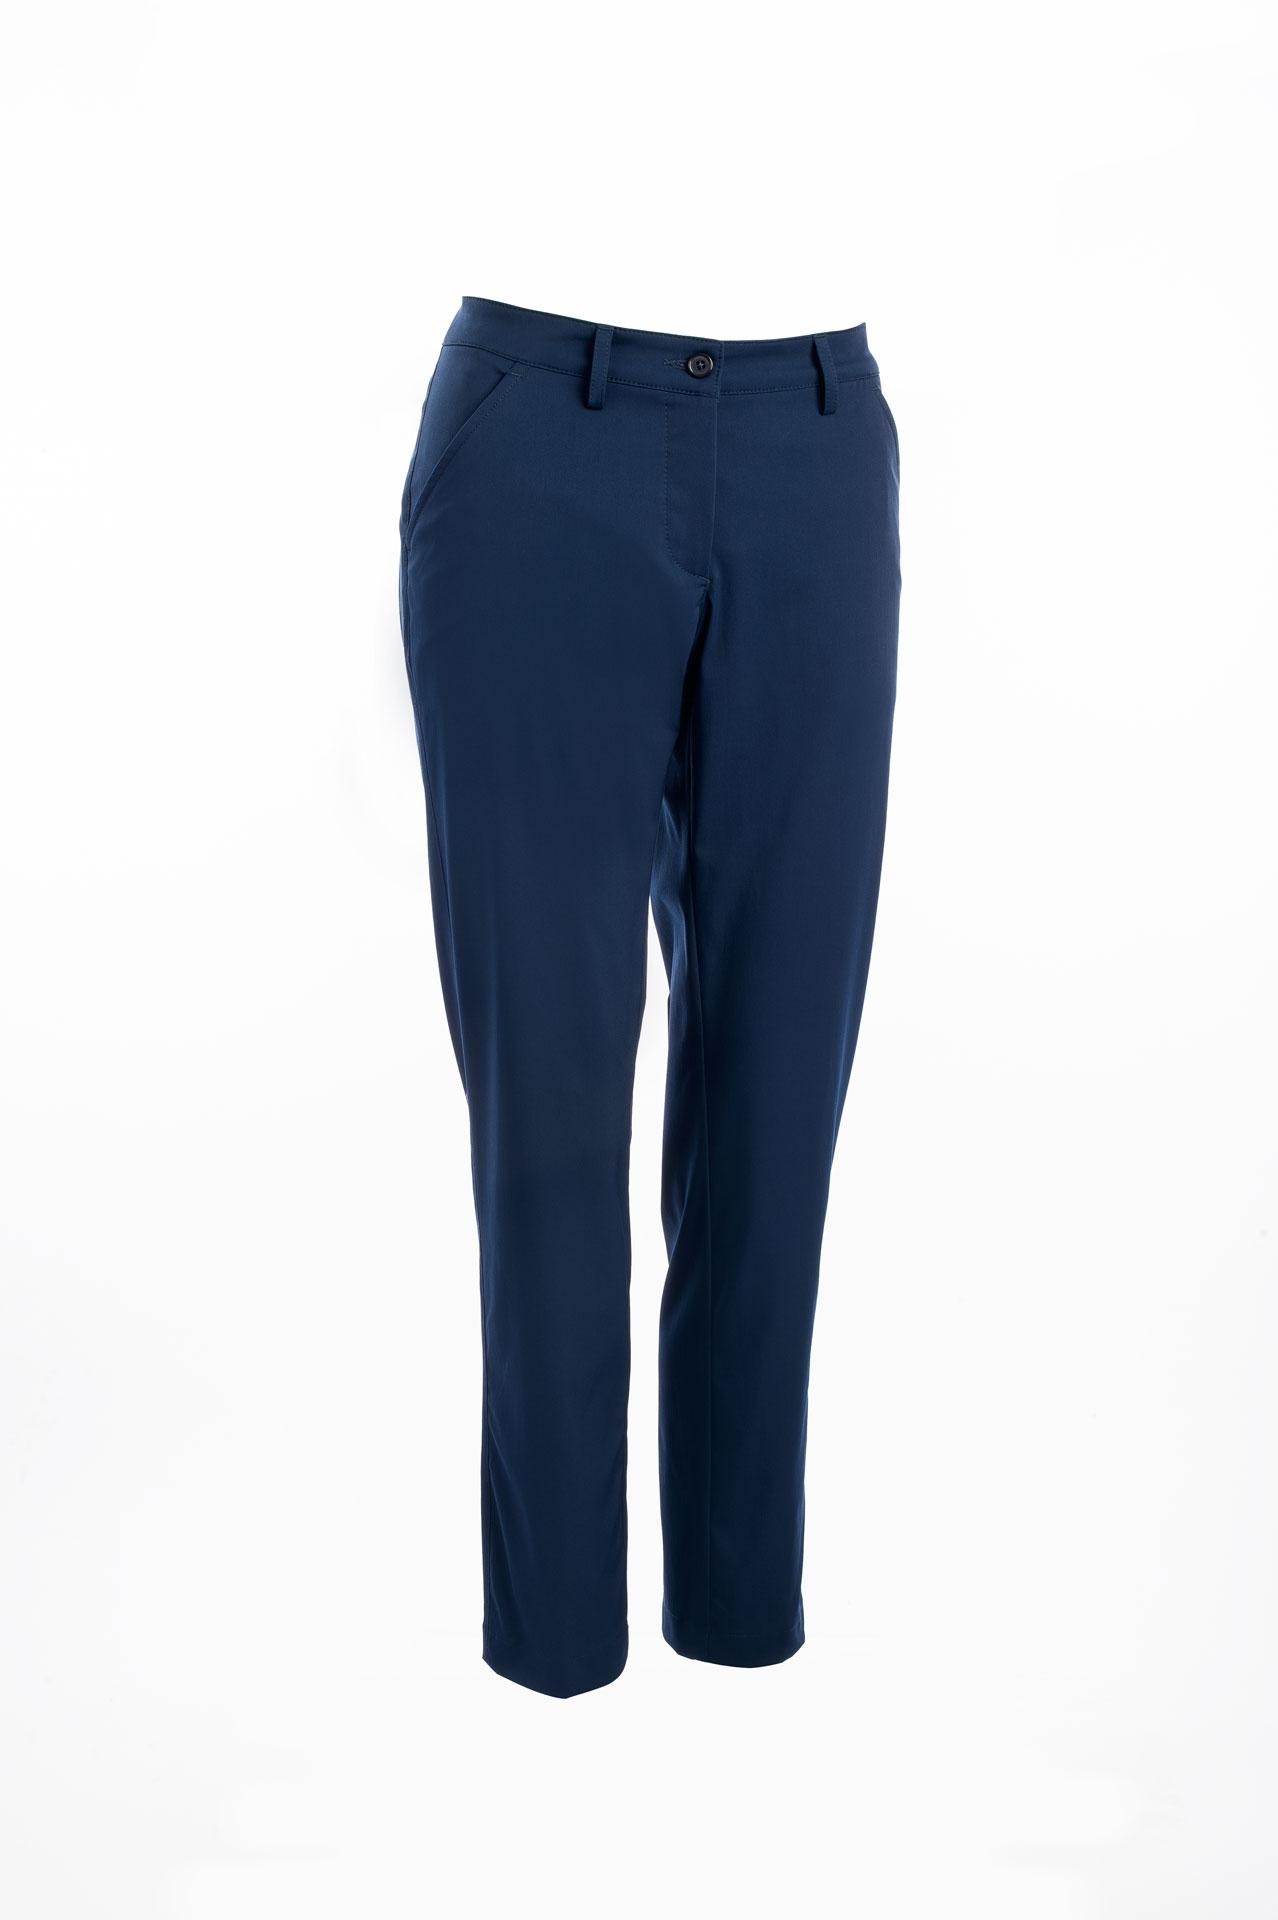 Pantalone lungo Art.2000 colore 5868 navy